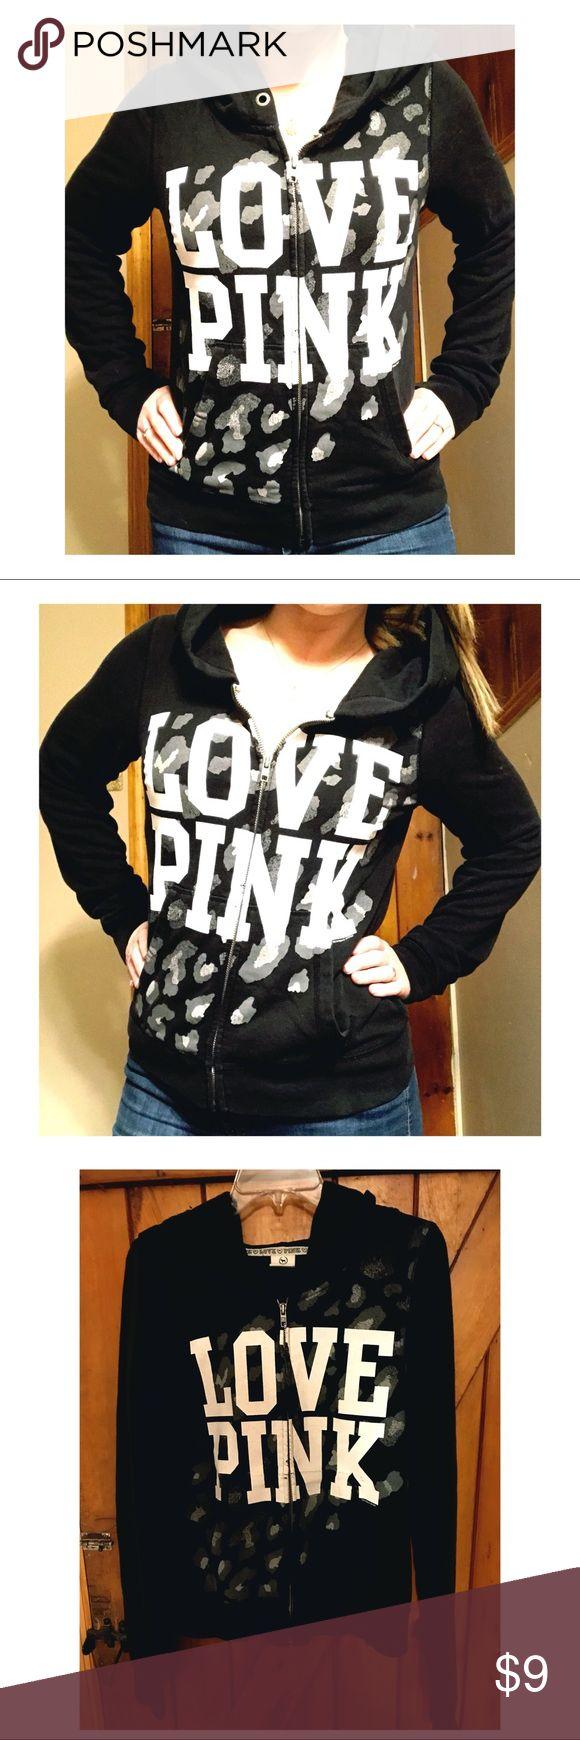 VS PINK zip up hoodie Victoria's Secret PINK, black zip up hoodie with pockets. No rips/tears/holes. PINK Victoria's Secret Tops Sweatshirts & Hoodies